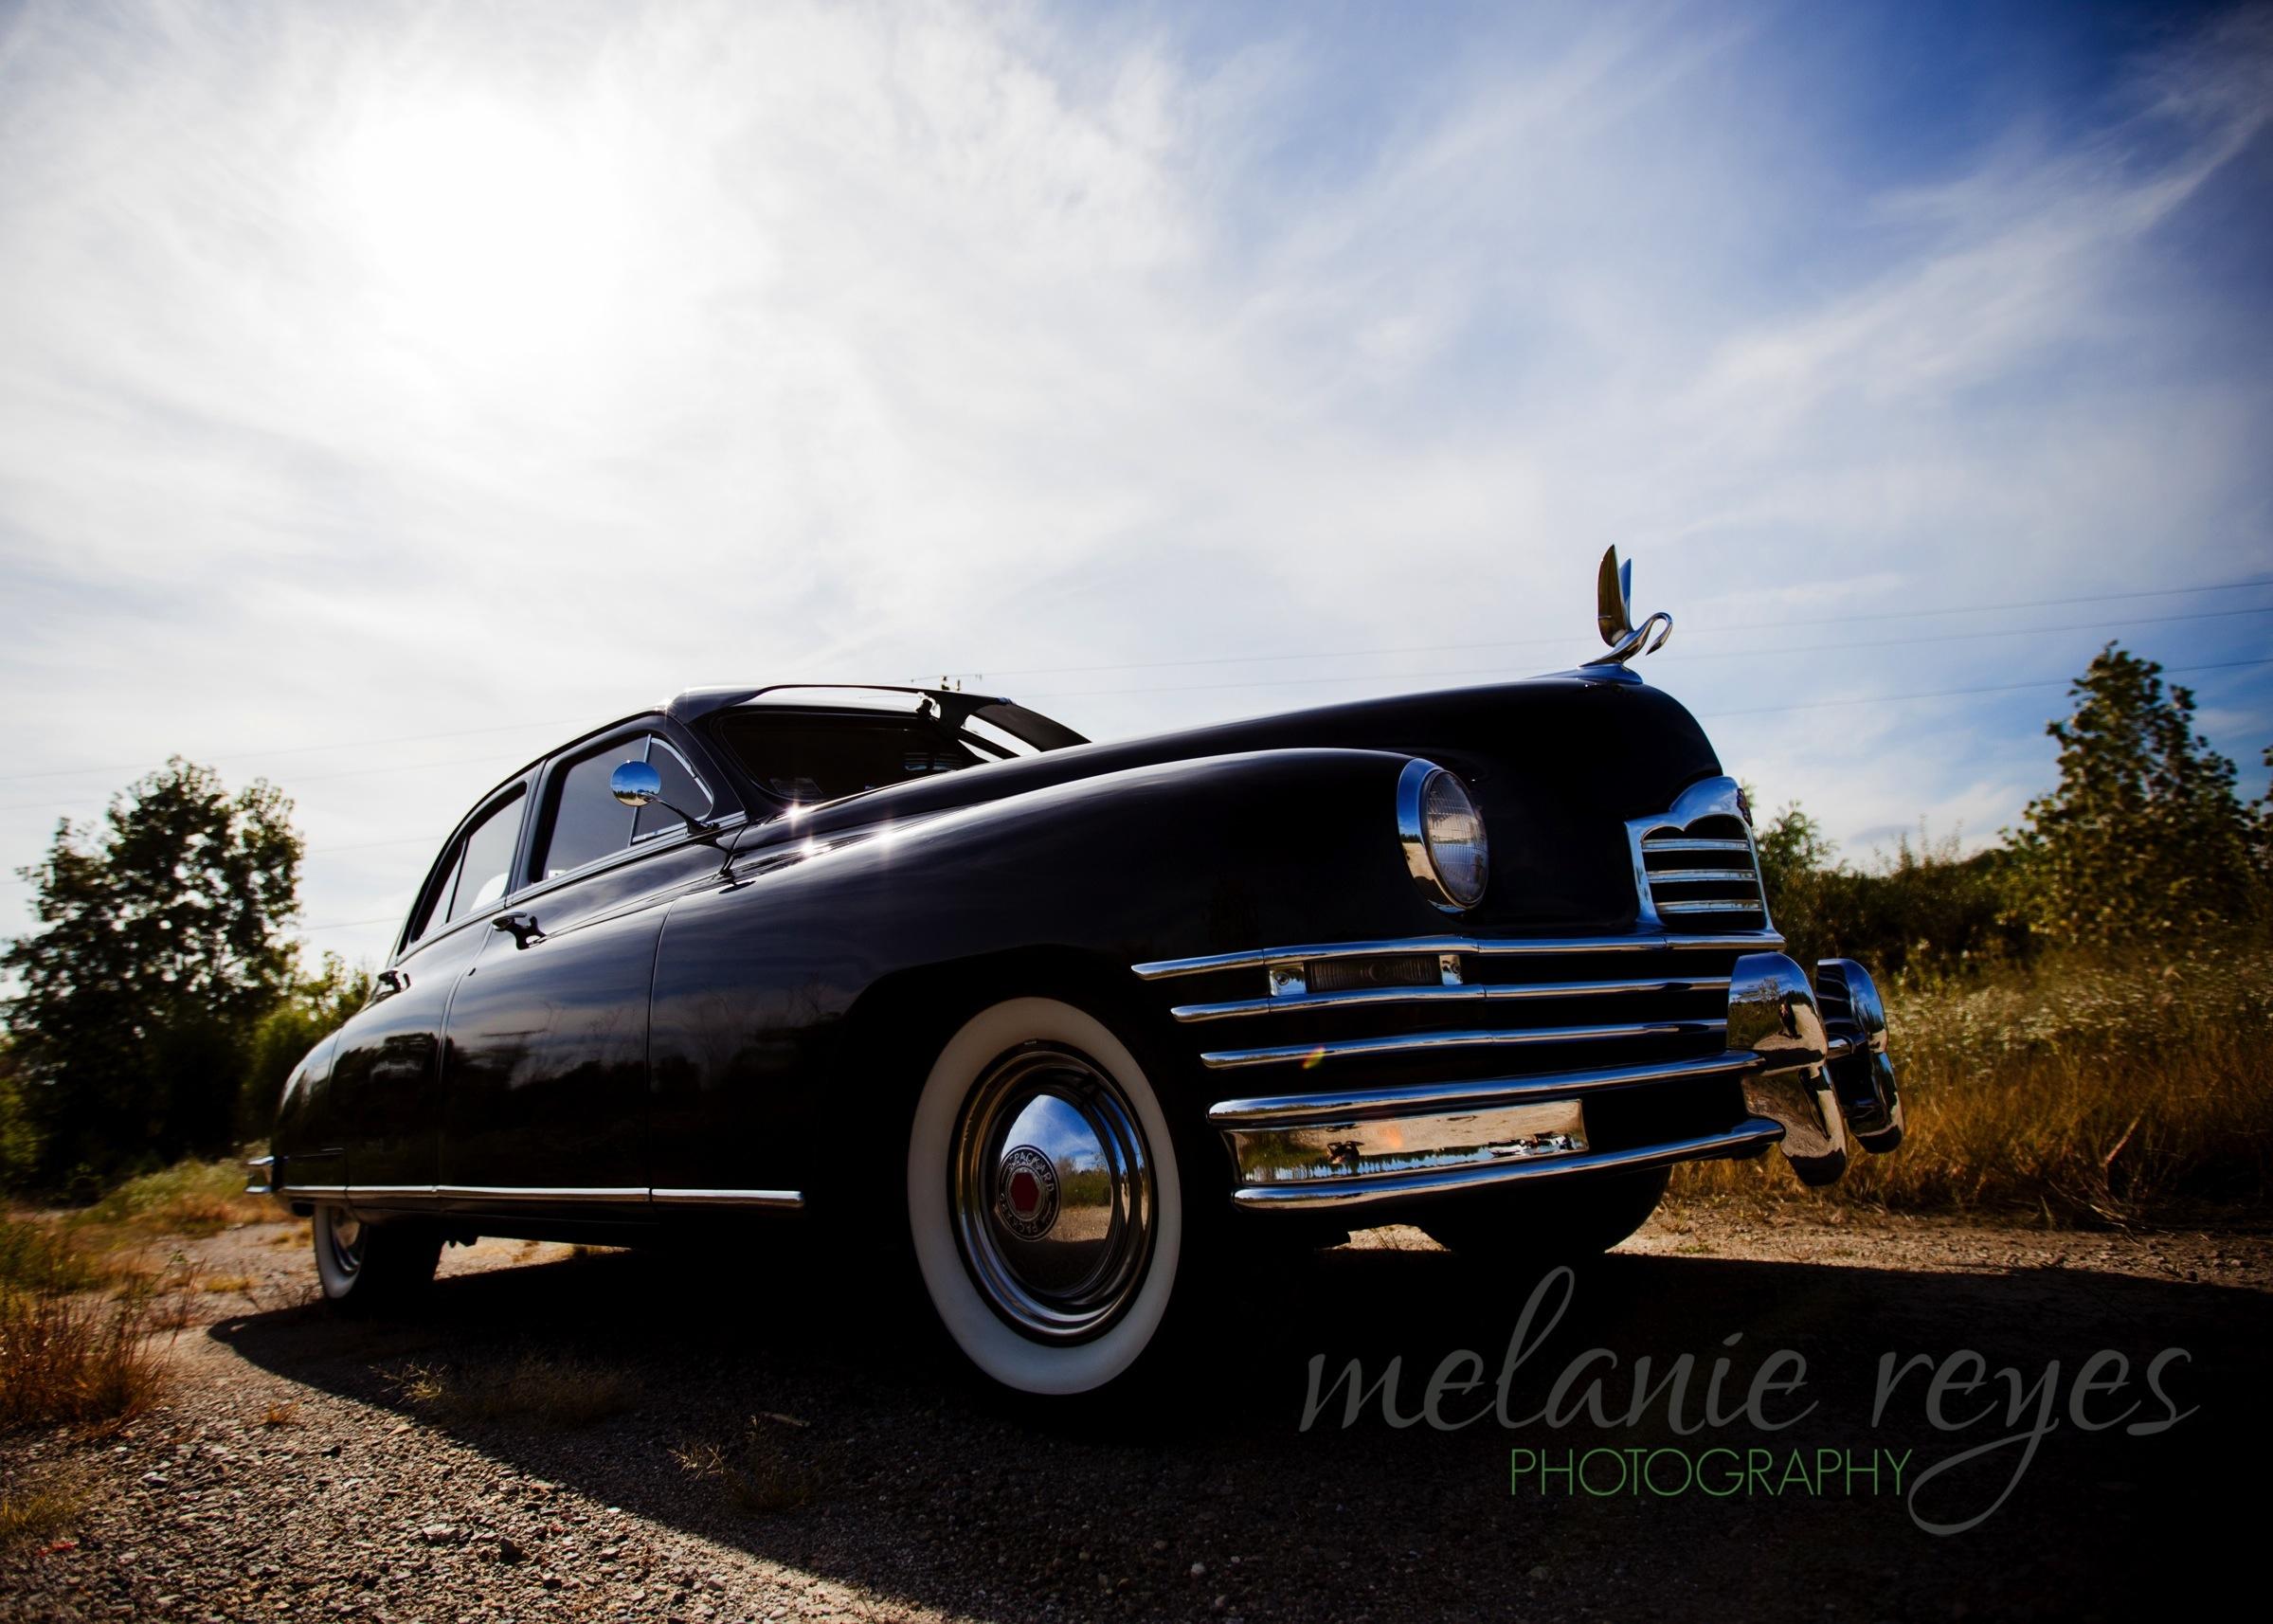 melanie_reyes_photography__motor_city_vintage_rentals_090